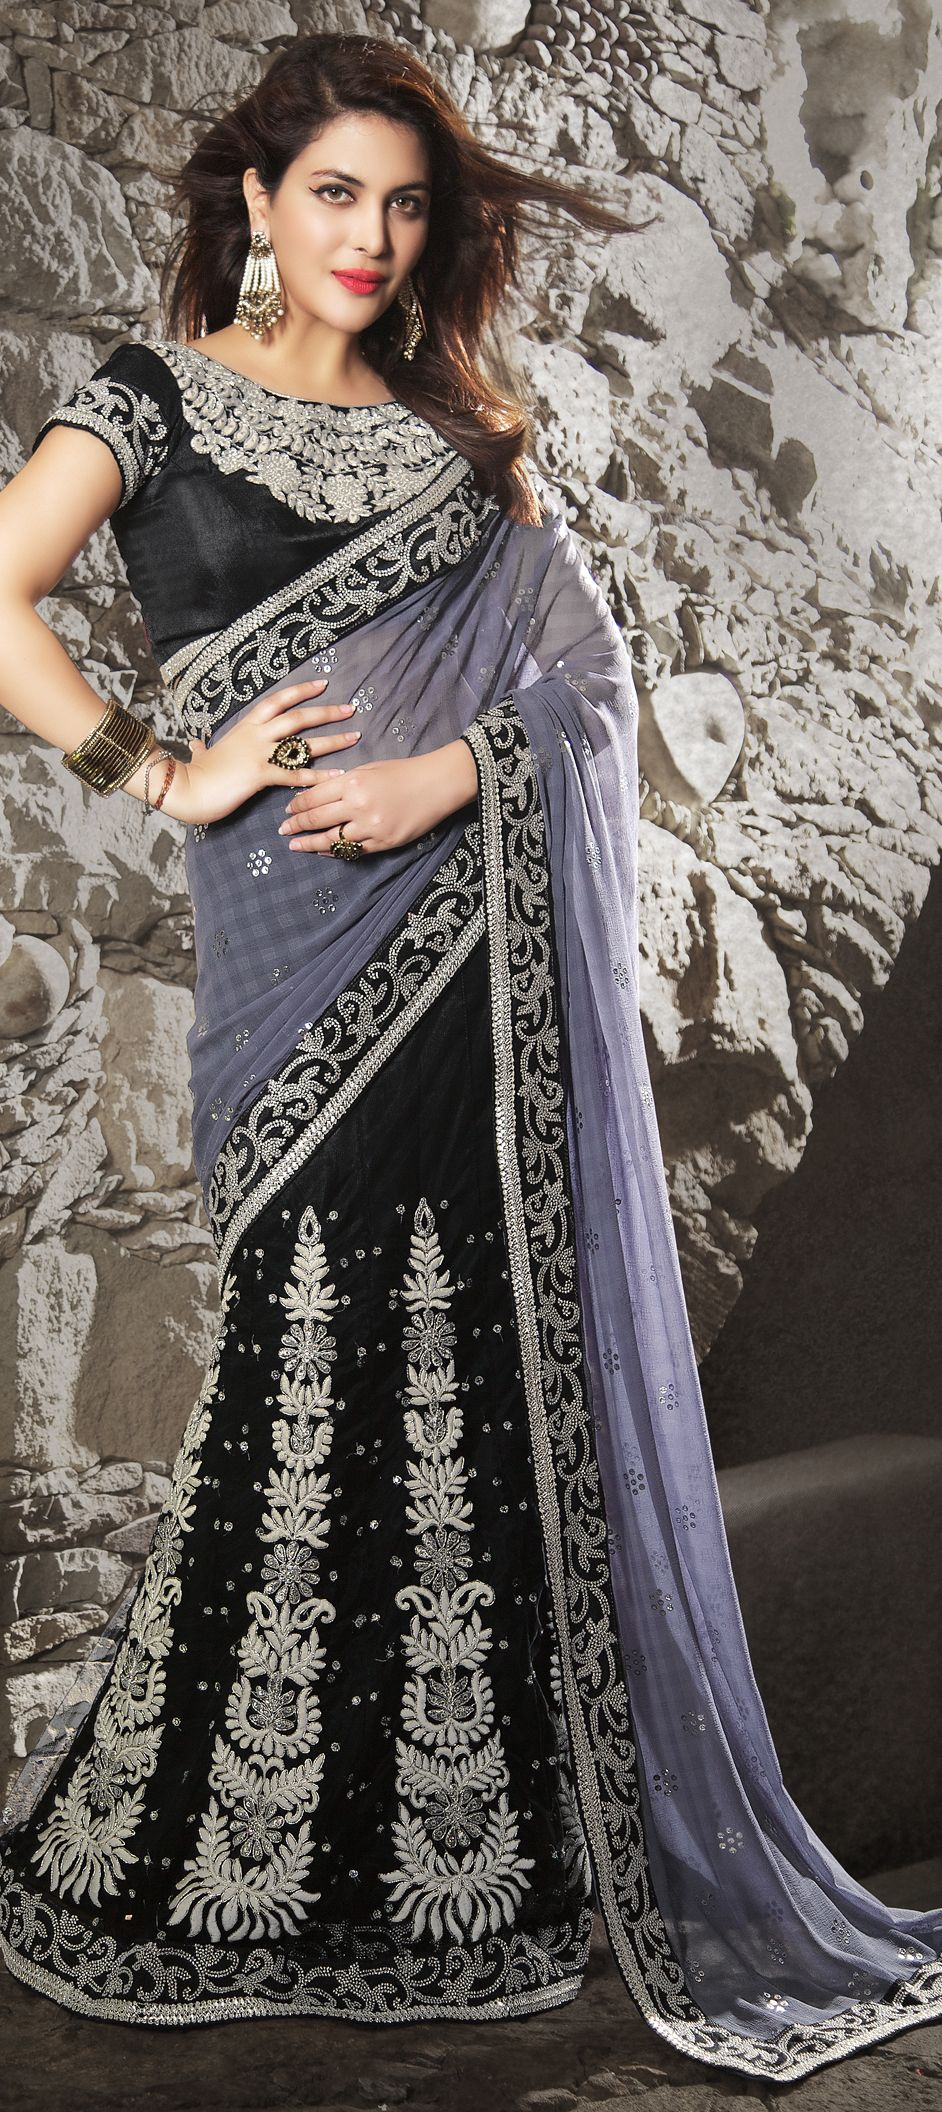 Pin by Joshindia.com on Lehenga Style | Lehenga style saree, Lehenga style, Lehenga saree